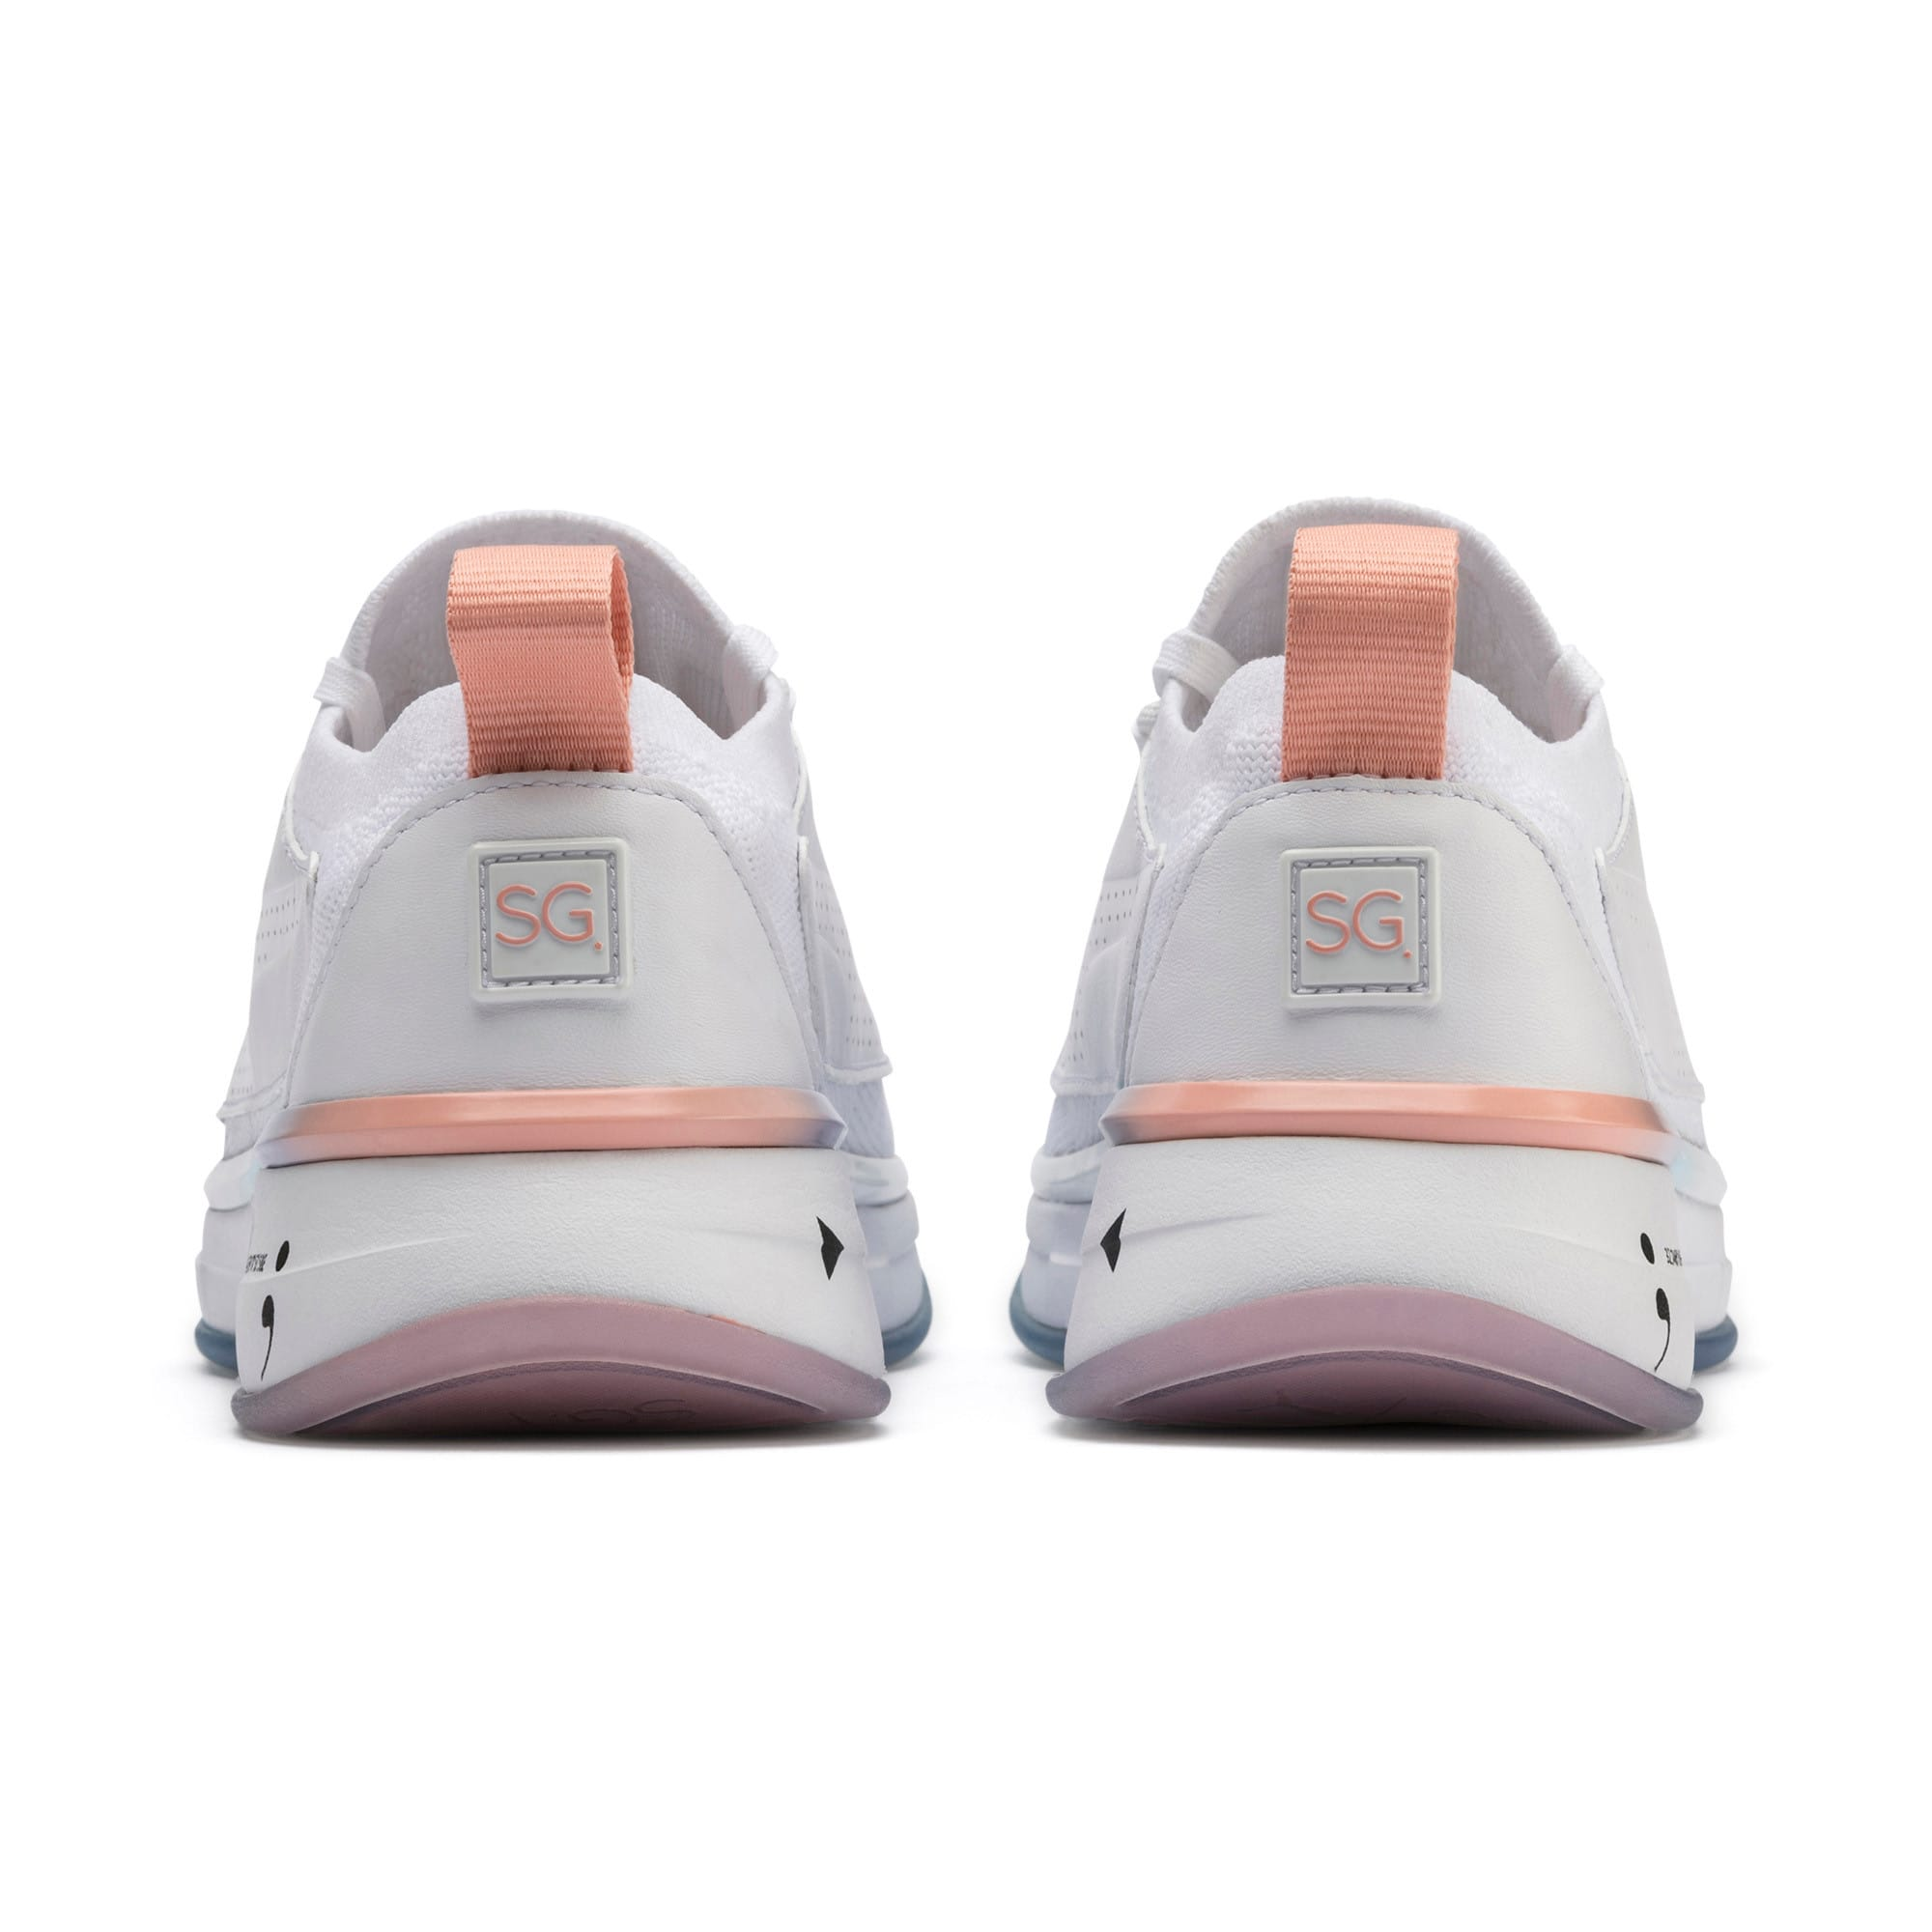 Thumbnail 4 of PUMA x SELENA GOMEZ Runner Women's Training Shoes, Puma White-Peach Bud, medium